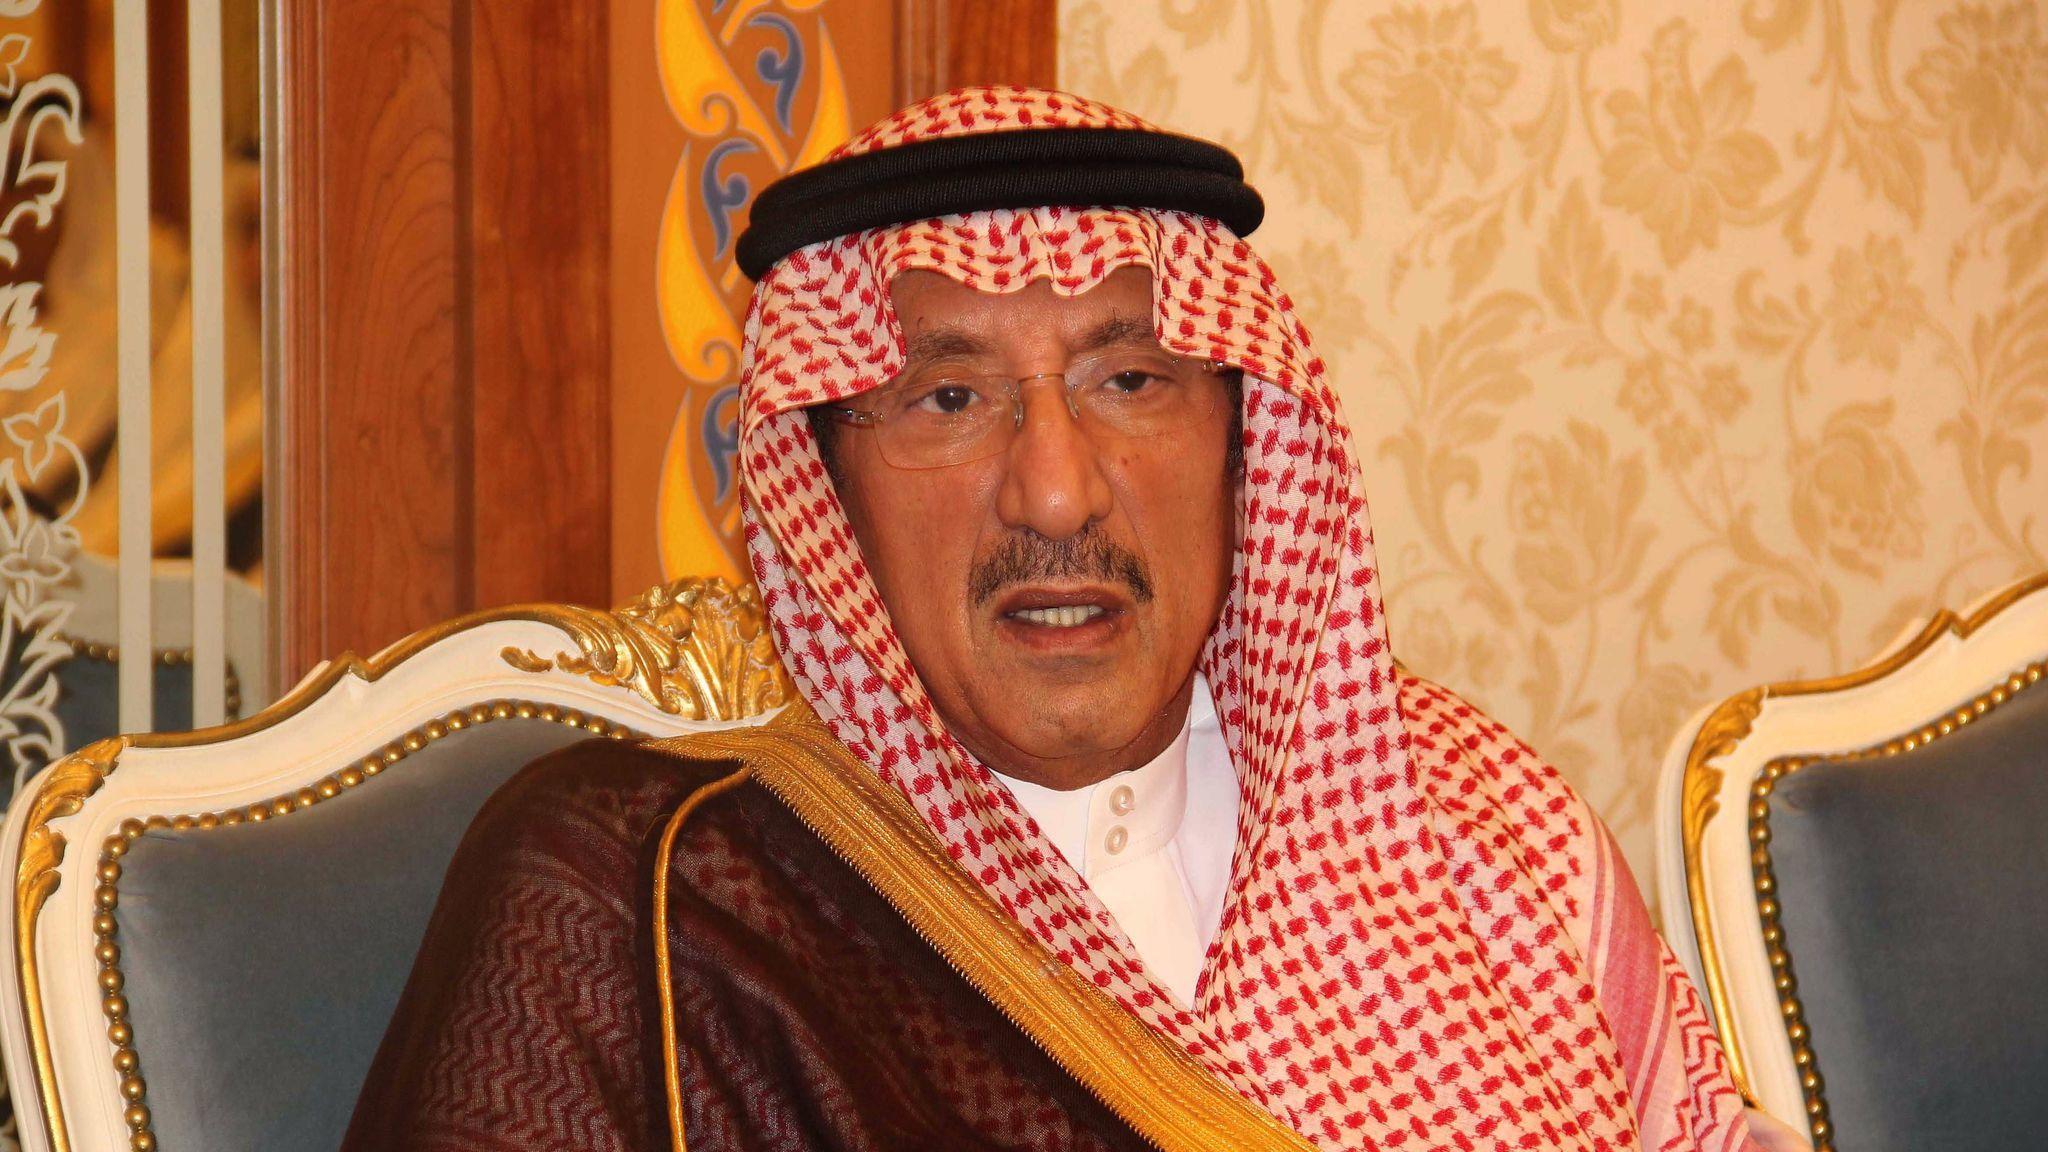 Saudi Arabian Prince Mutaib